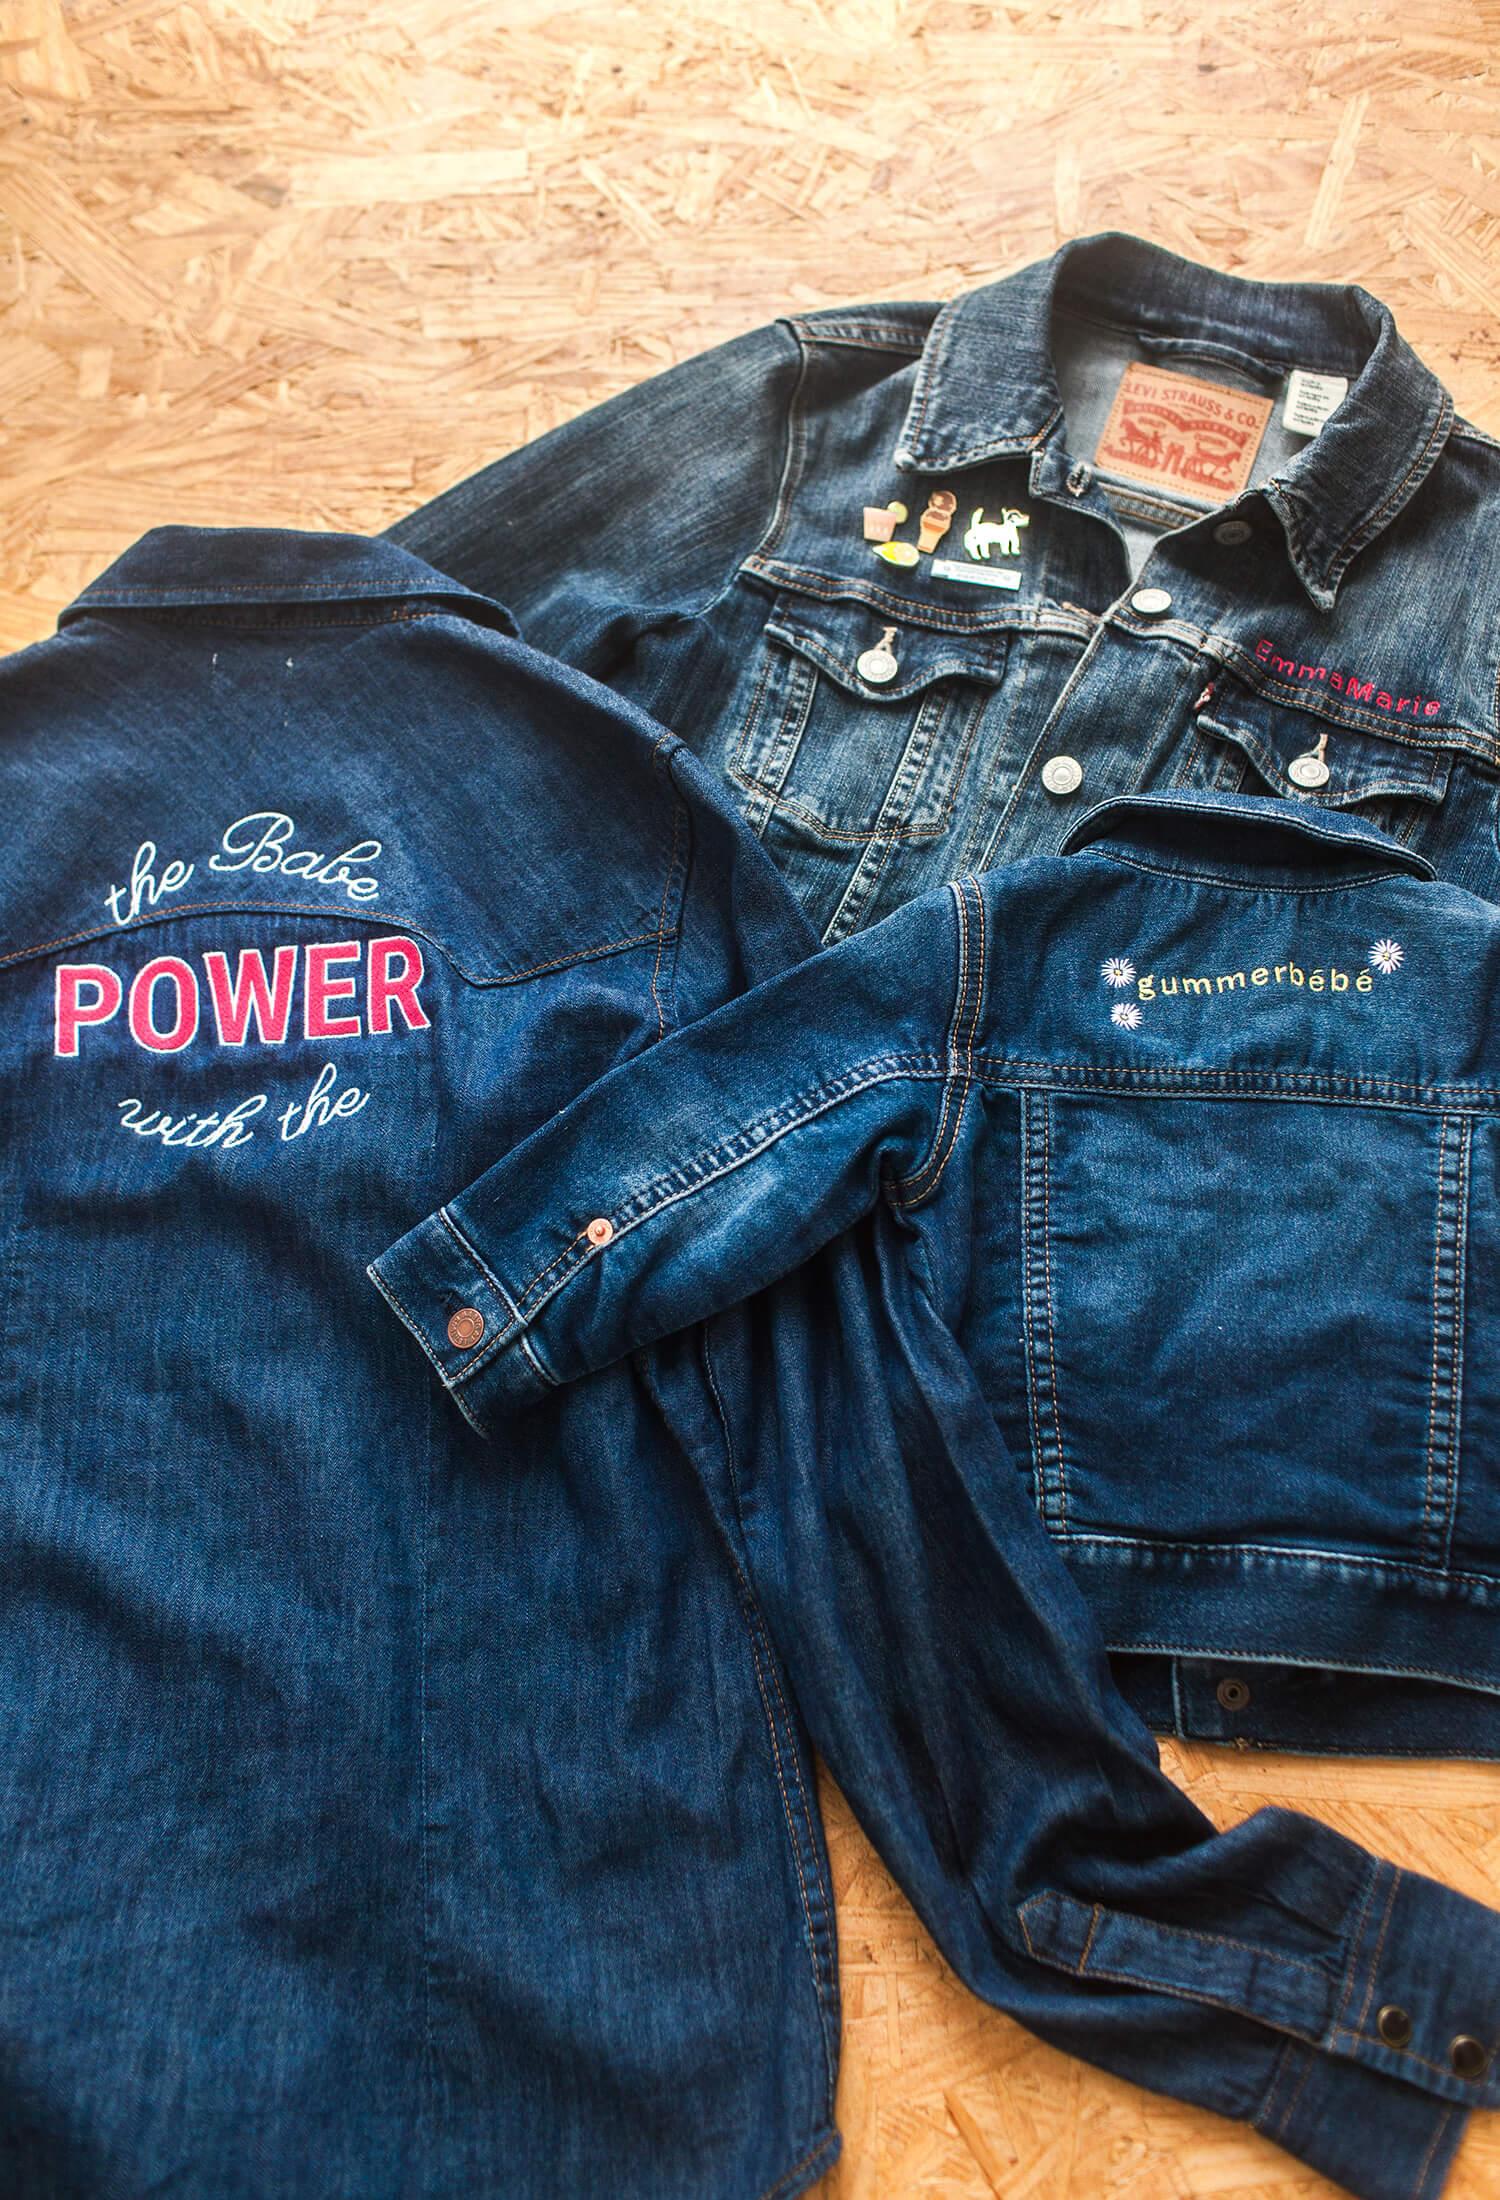 Diy Embroidered Denim Jacket (via Abeautifulmess)